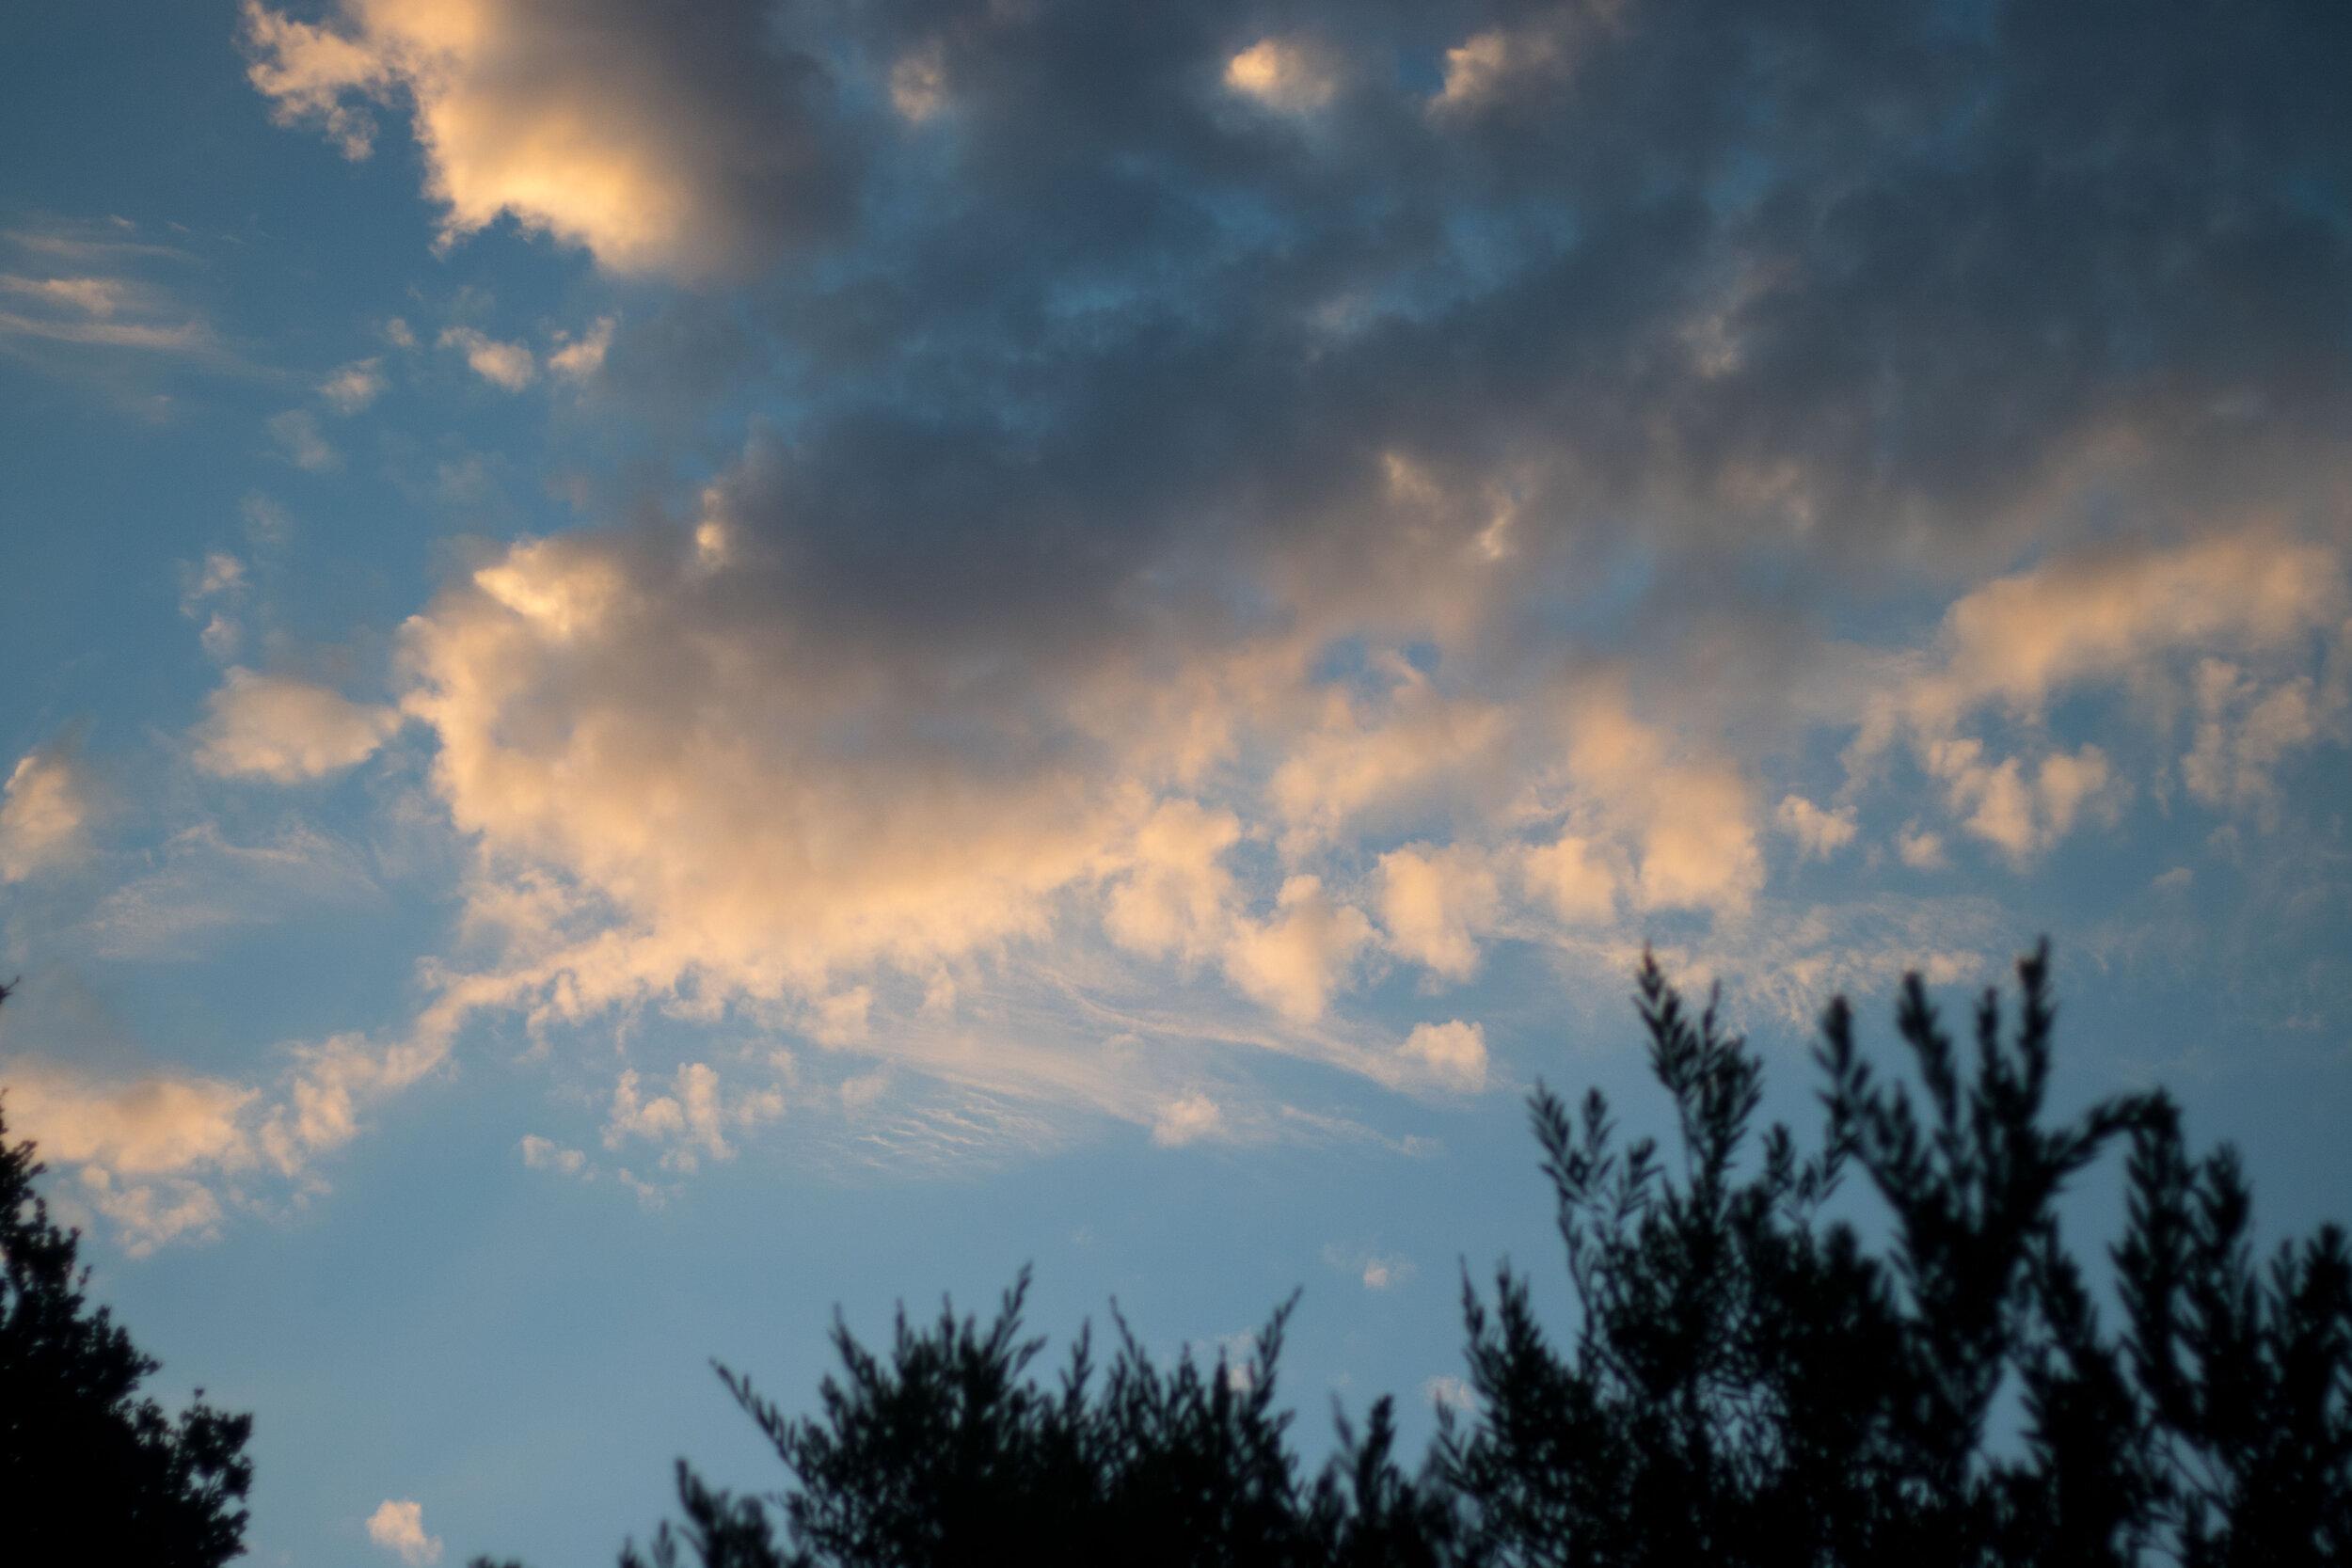 monterey-bay-california-clouds